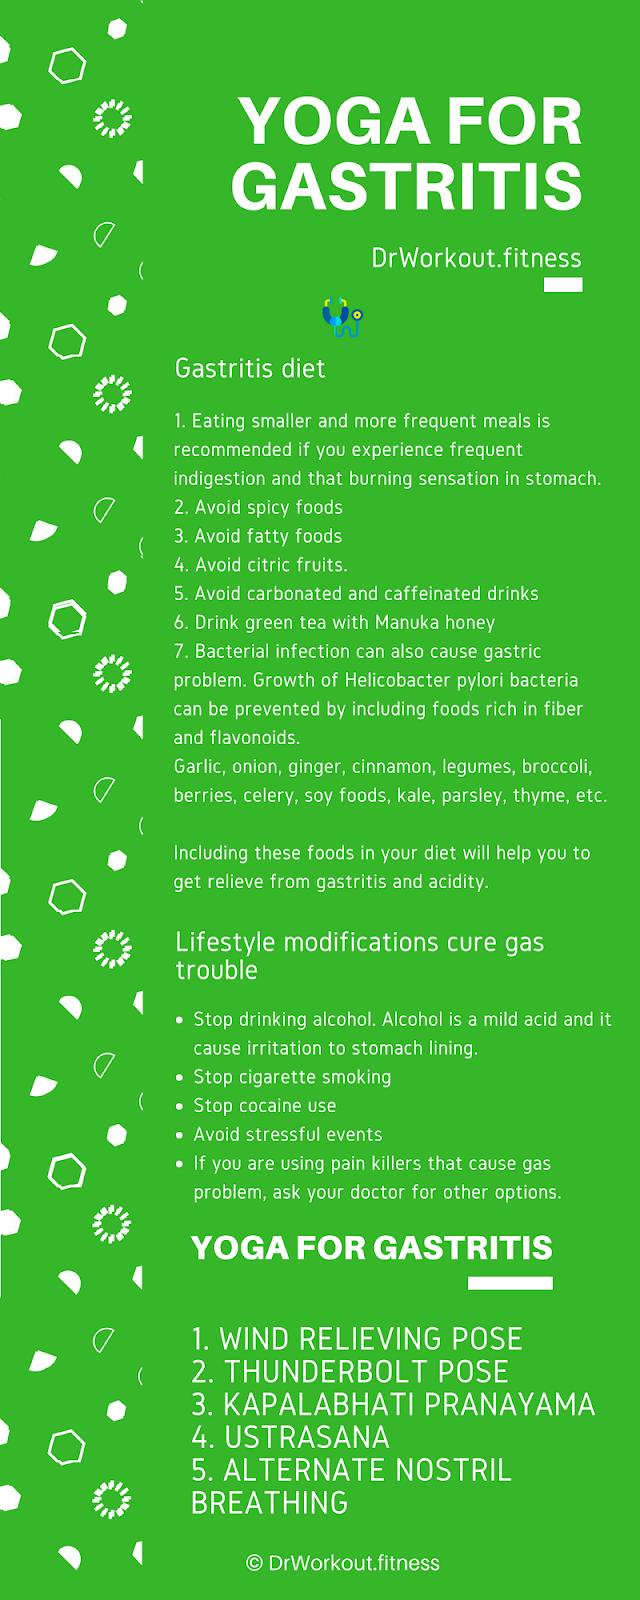 Yoga for gastritis | What is gastritis?| Symptoms of gastritis| What